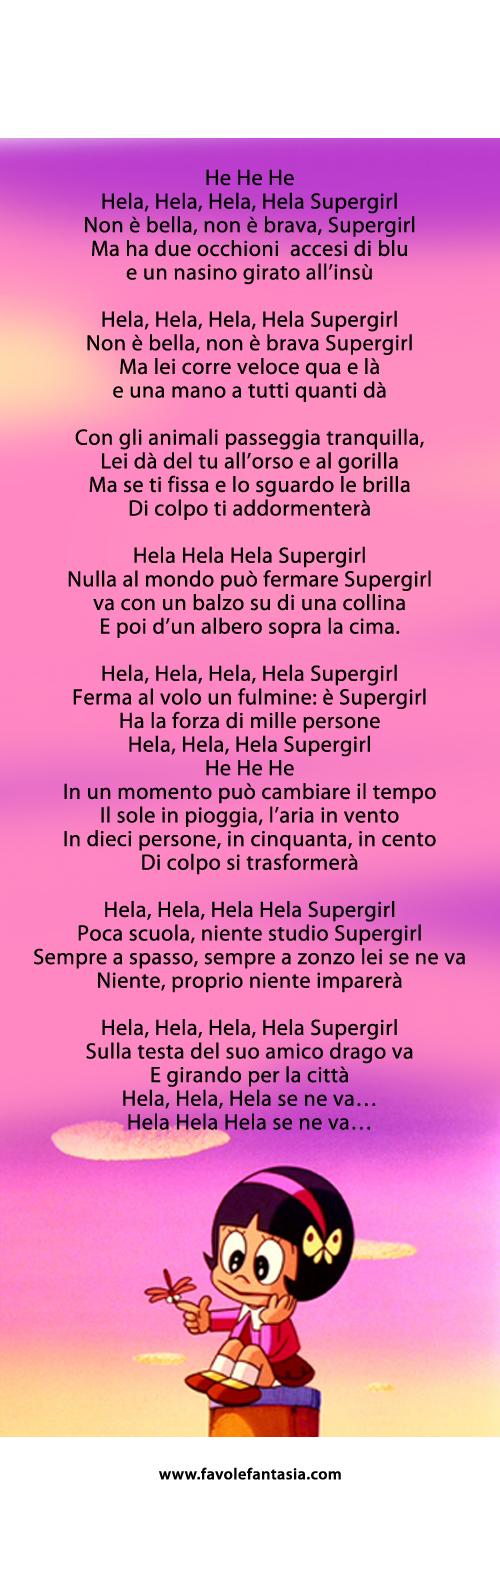 Hela Supergirl_sigla